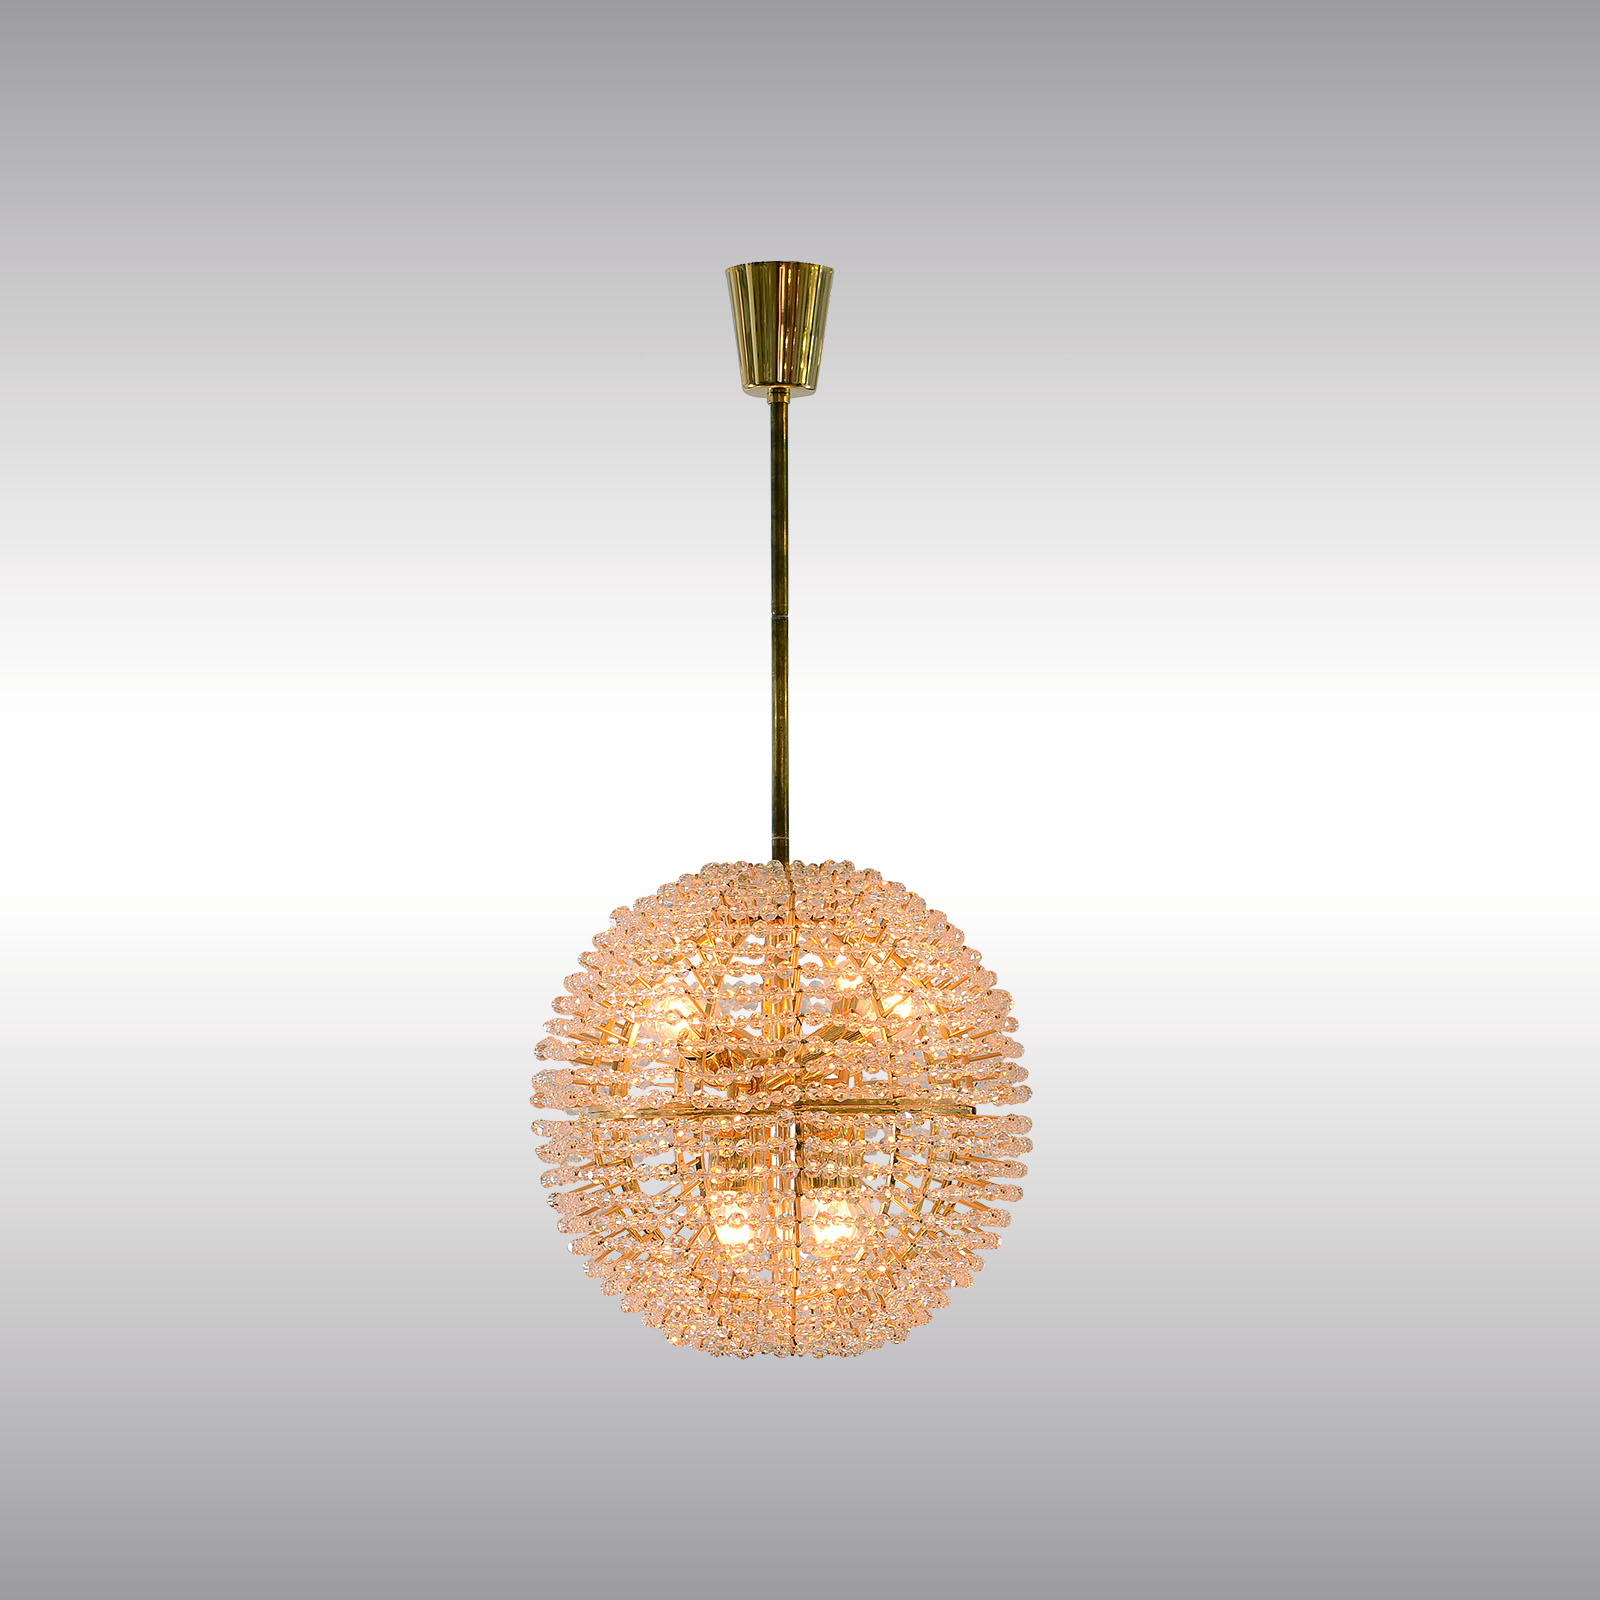 ICFF 2019 Amazing Woka Lamps and Furniture Designs - Bakalowits Supernova icff ICFF 2019: Amazing Woka Lamps and Furniture Designs ICFF 2019 Amazing Woka Lamps and Furniture Designs Bakalowits Supernova